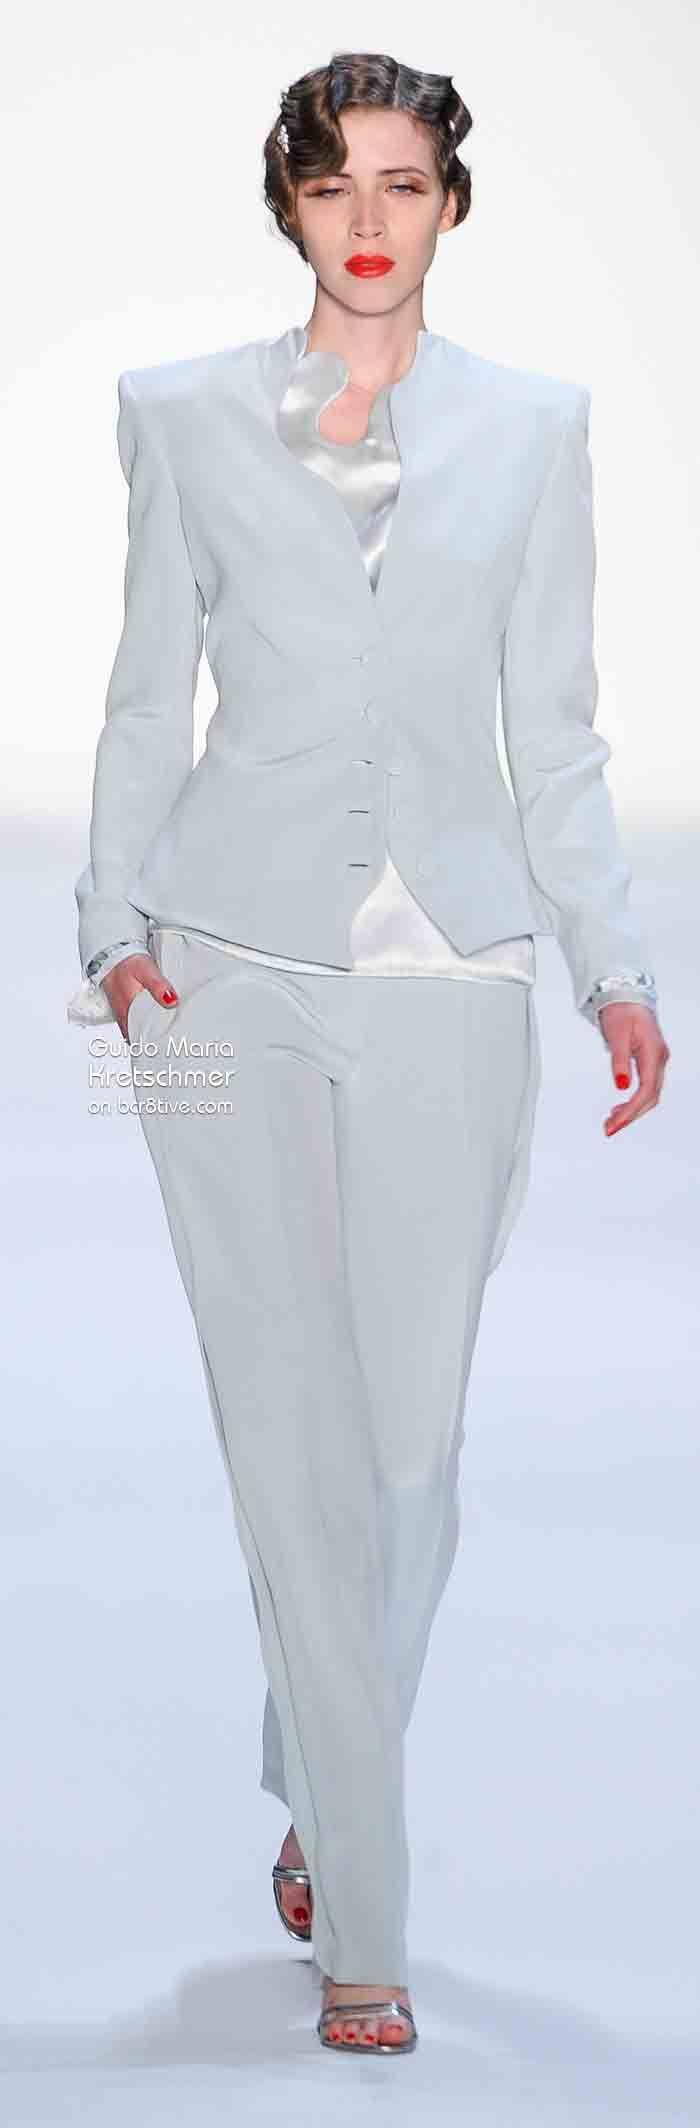 Guido Maria Kretschmer Spring 2014 - Berlin Fashion Week